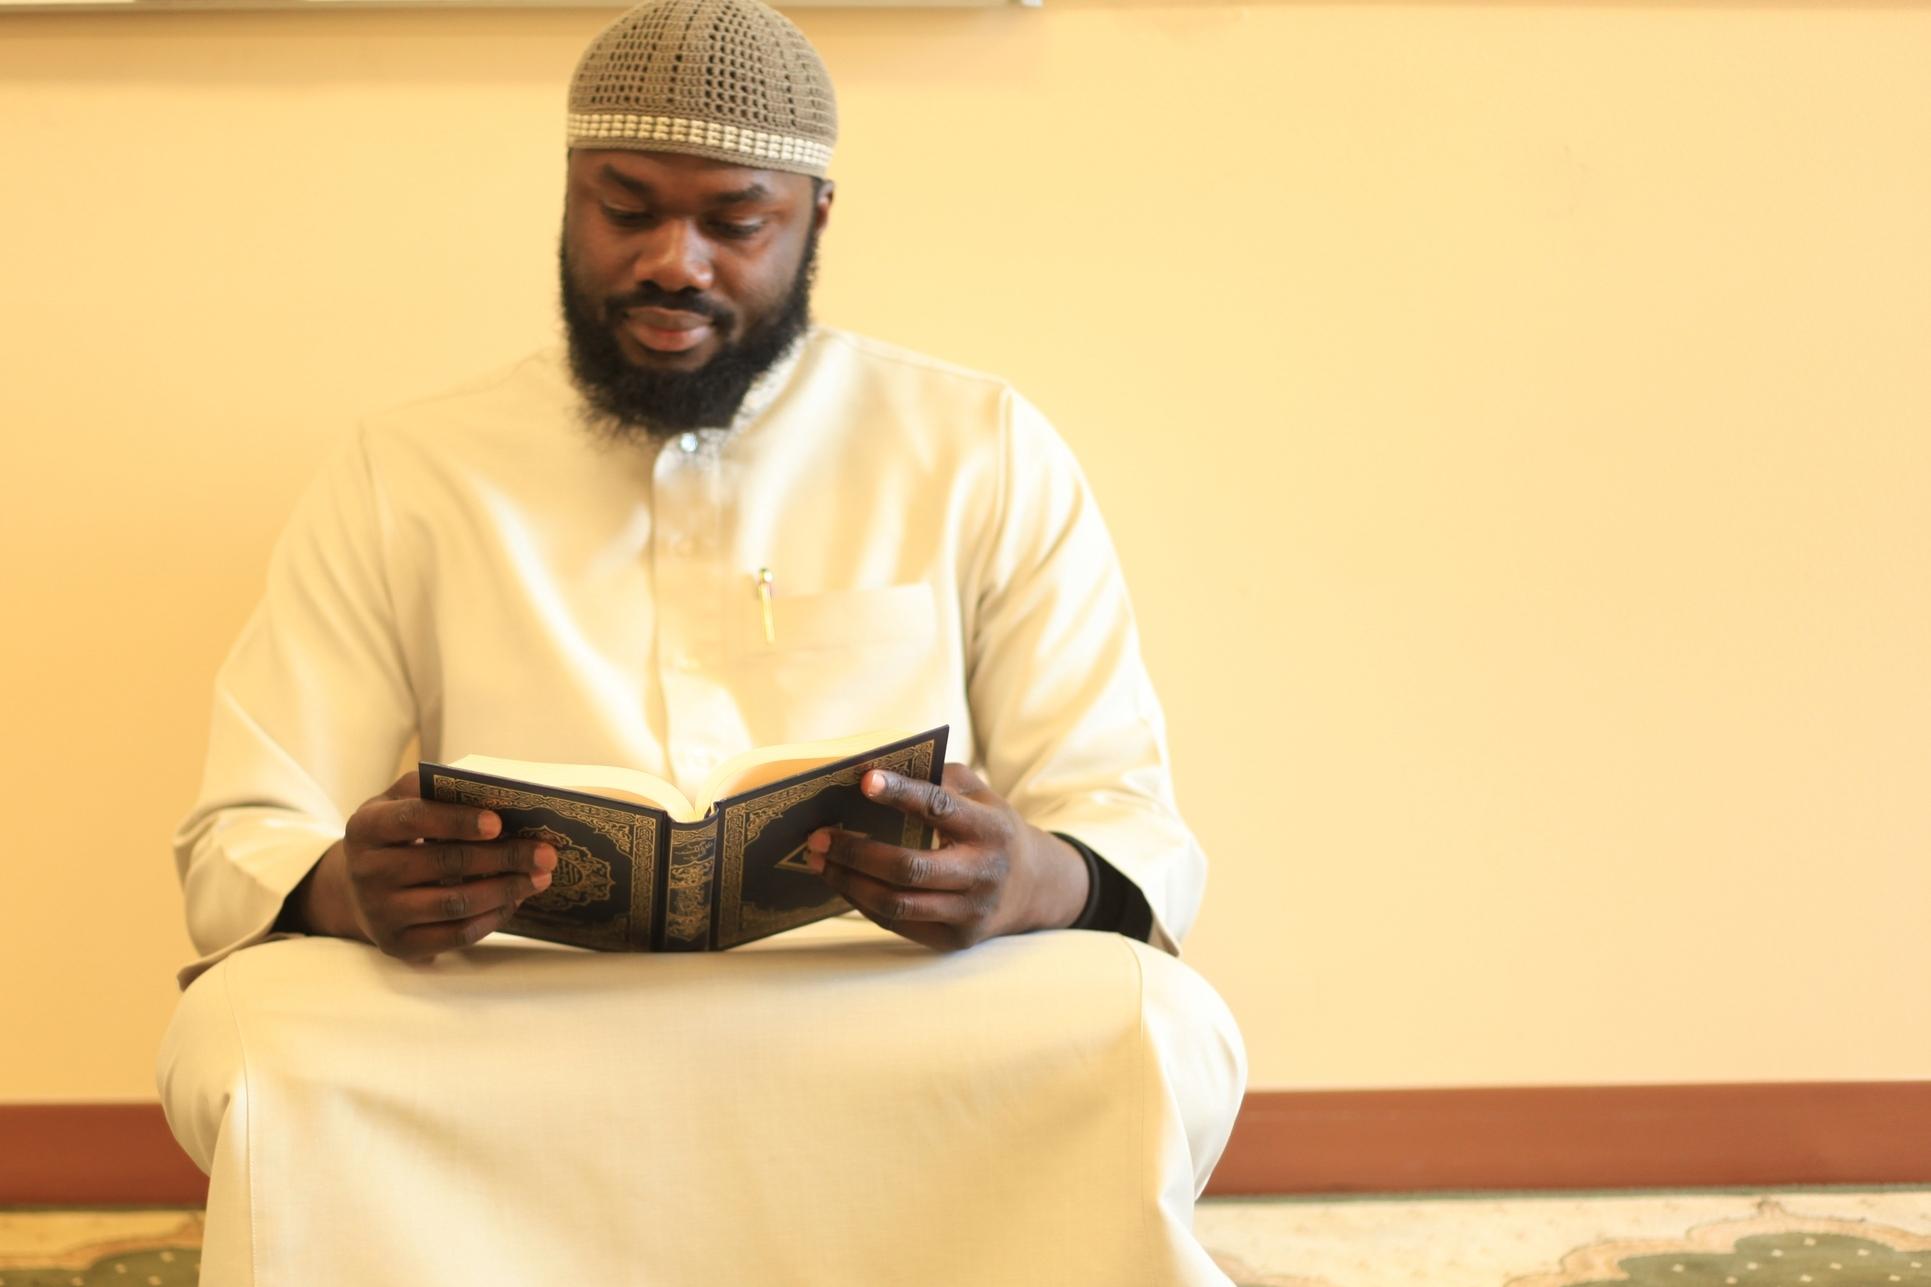 Imam Nuhu Abdula